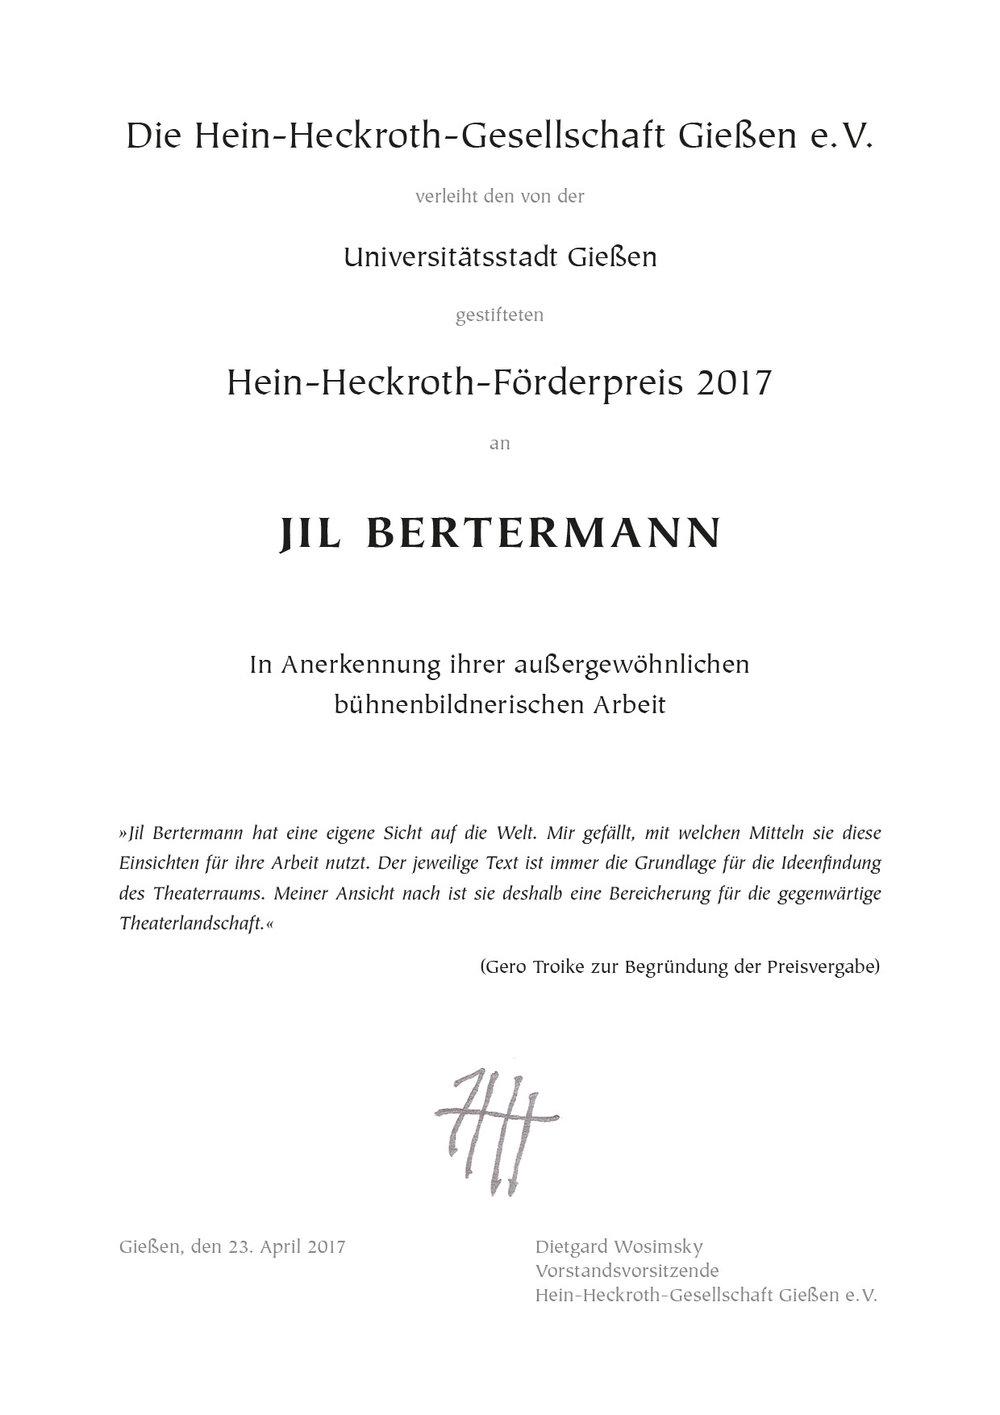 Urkunde Jil Bertermann